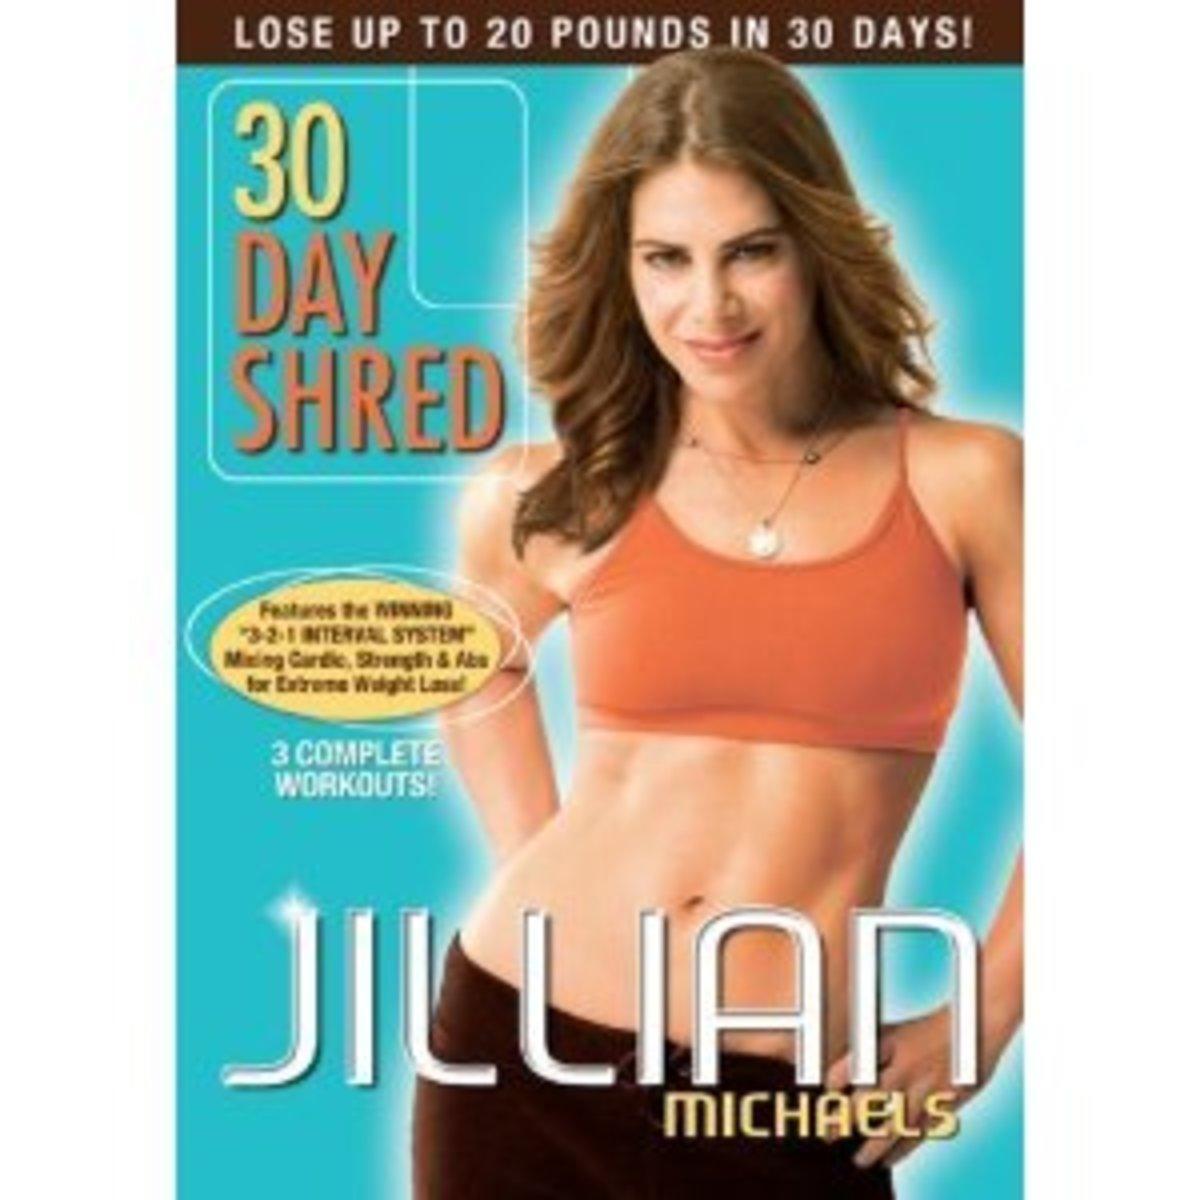 jillian michaels 30 day shred